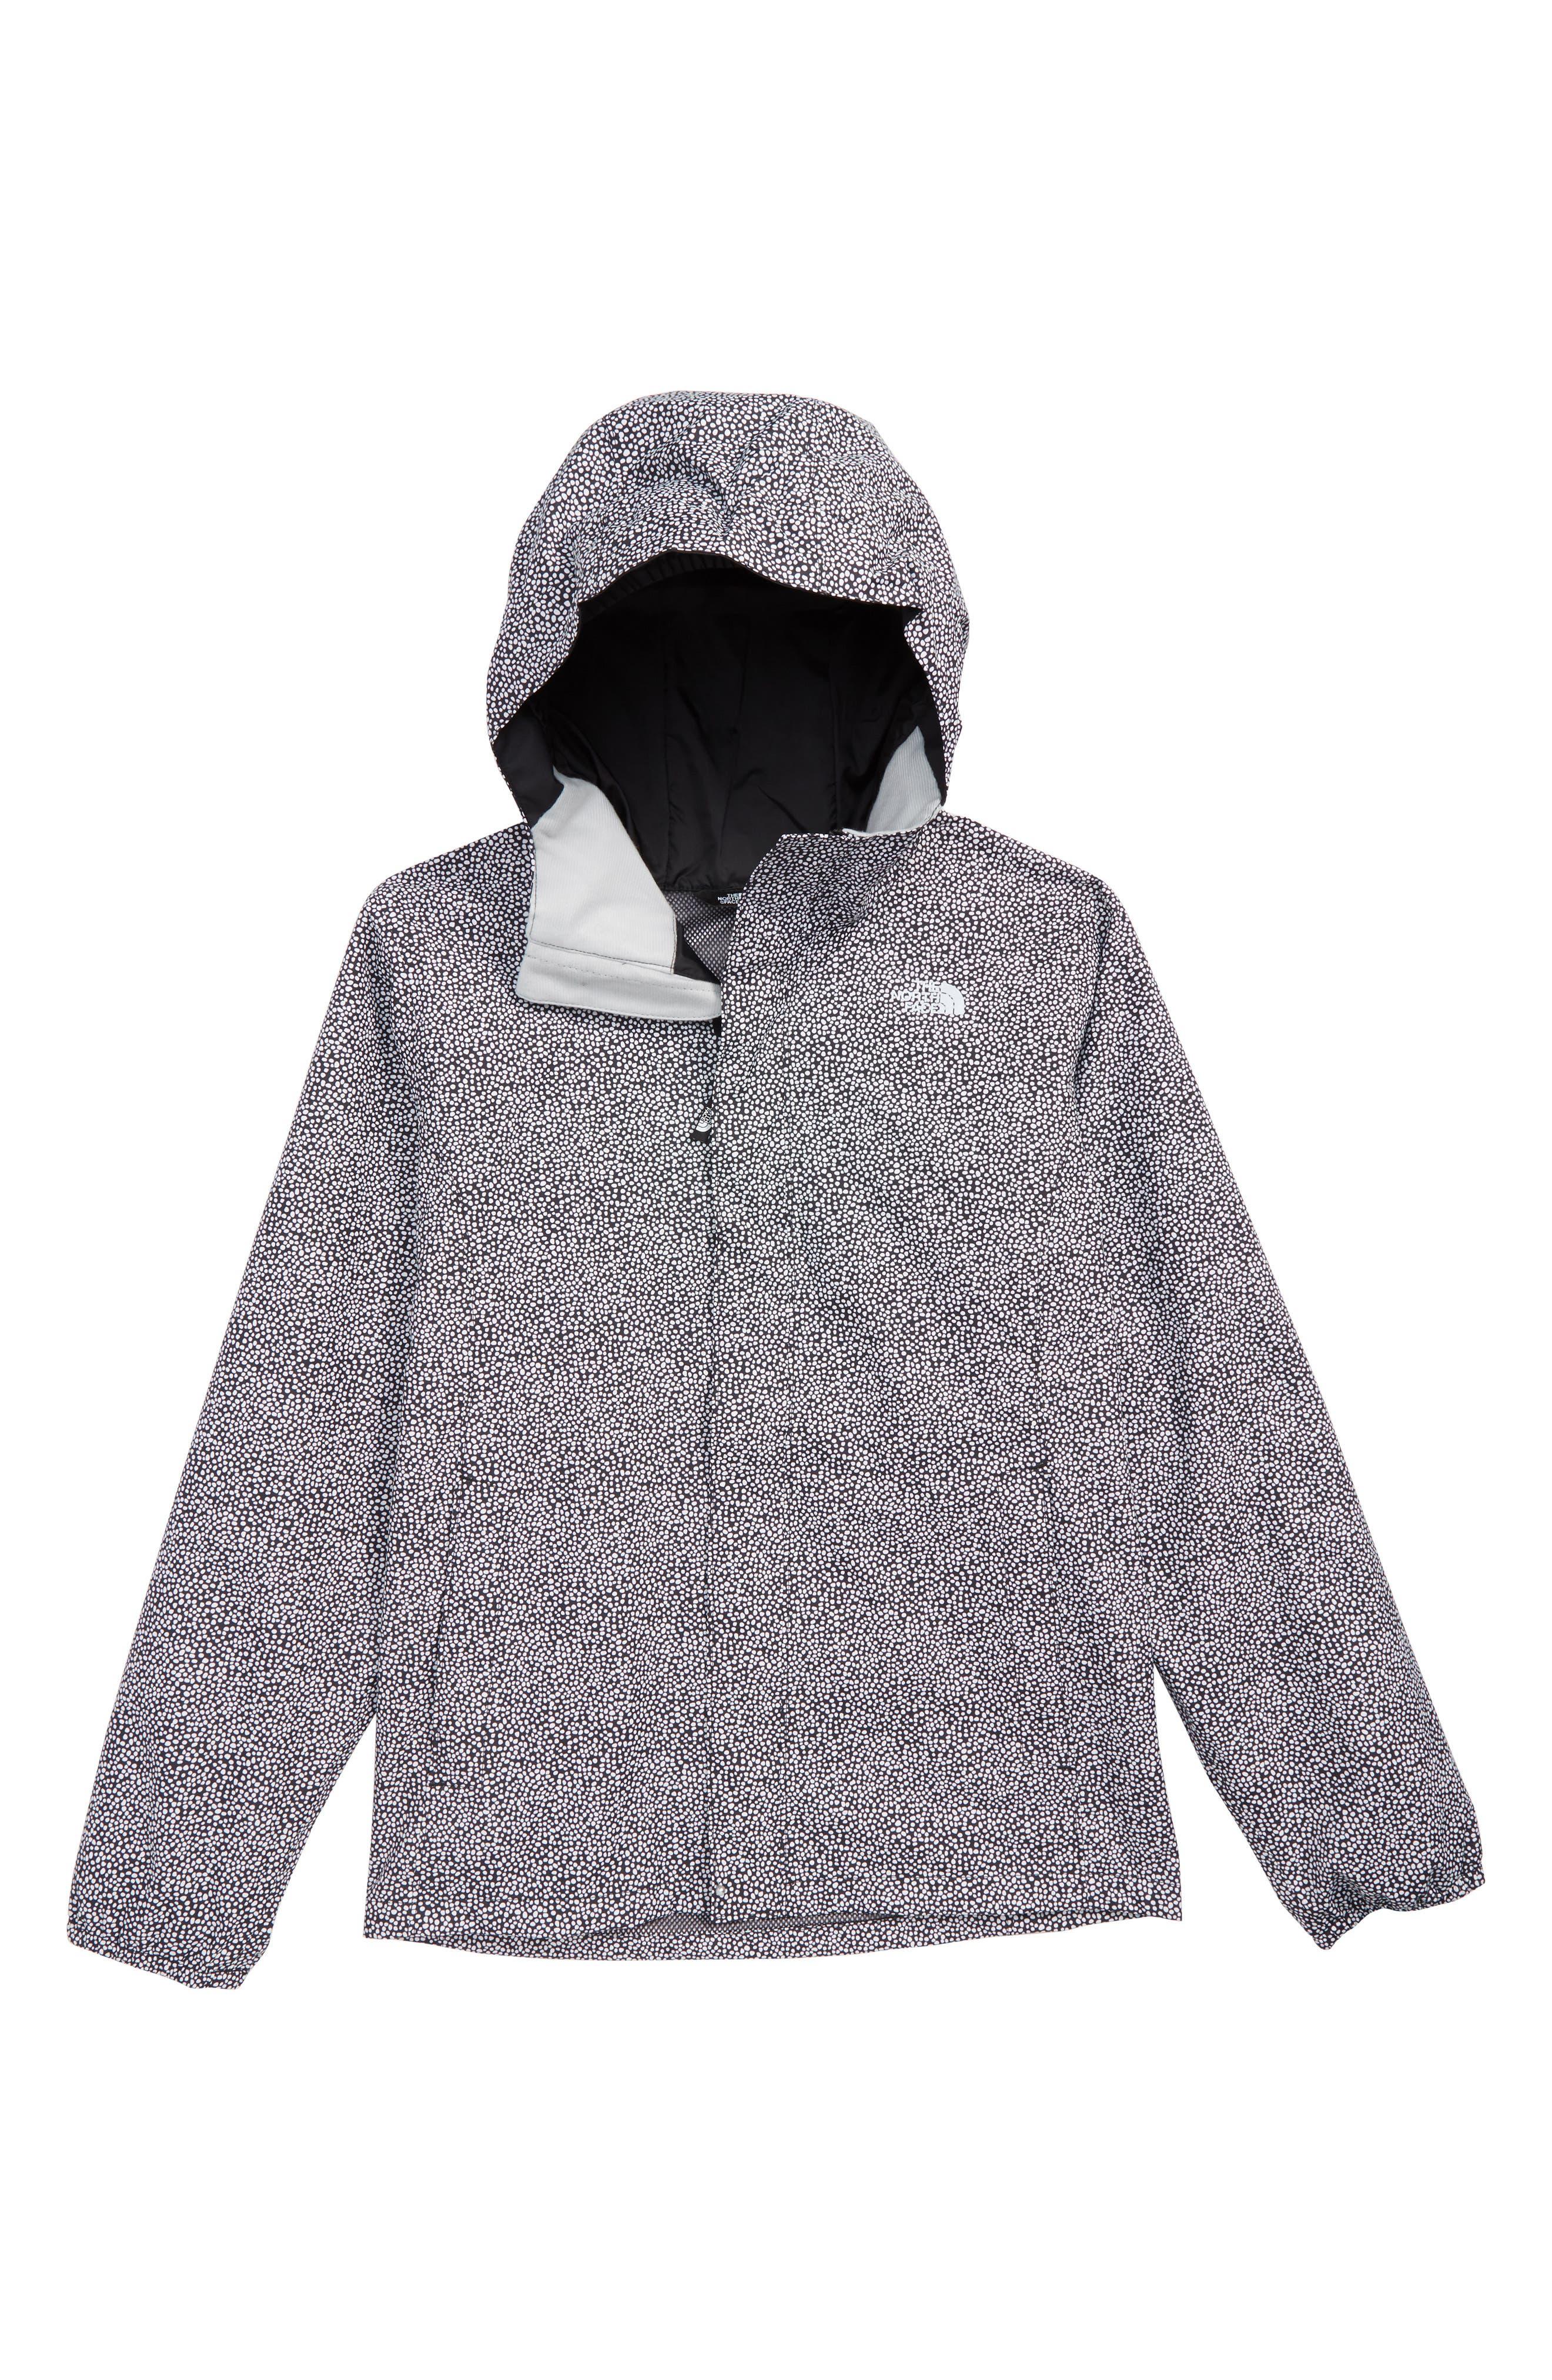 Resolve Reflective Waterproof Jacket,                             Main thumbnail 1, color,                             TNF WHITE MINI DOT PRINT